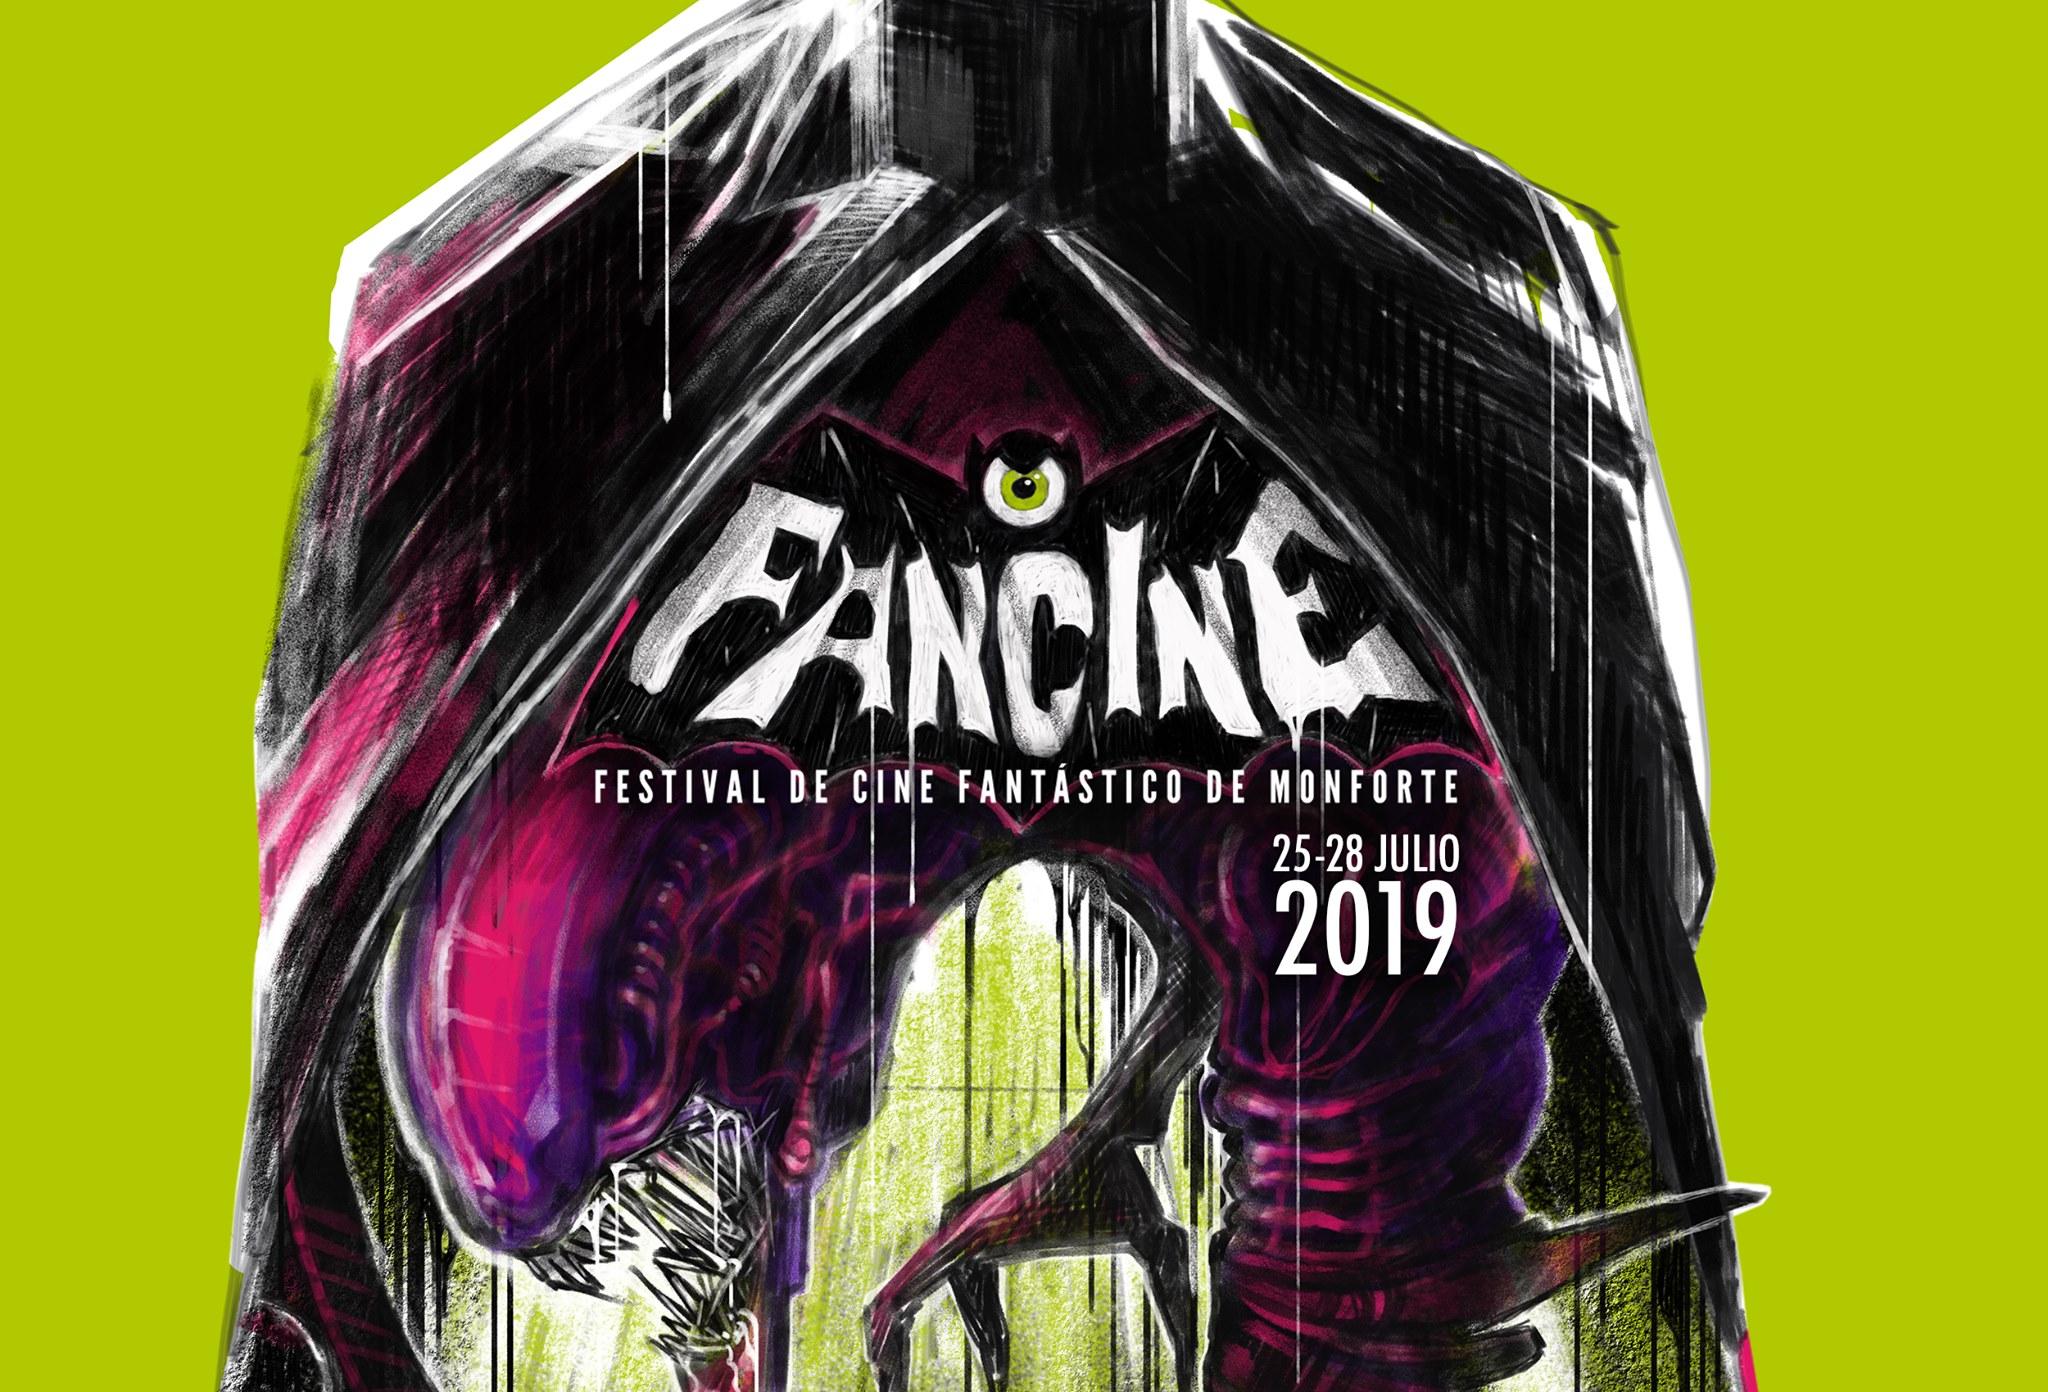 FanCine - Festival de cine fantástico de Monforte de Lemos